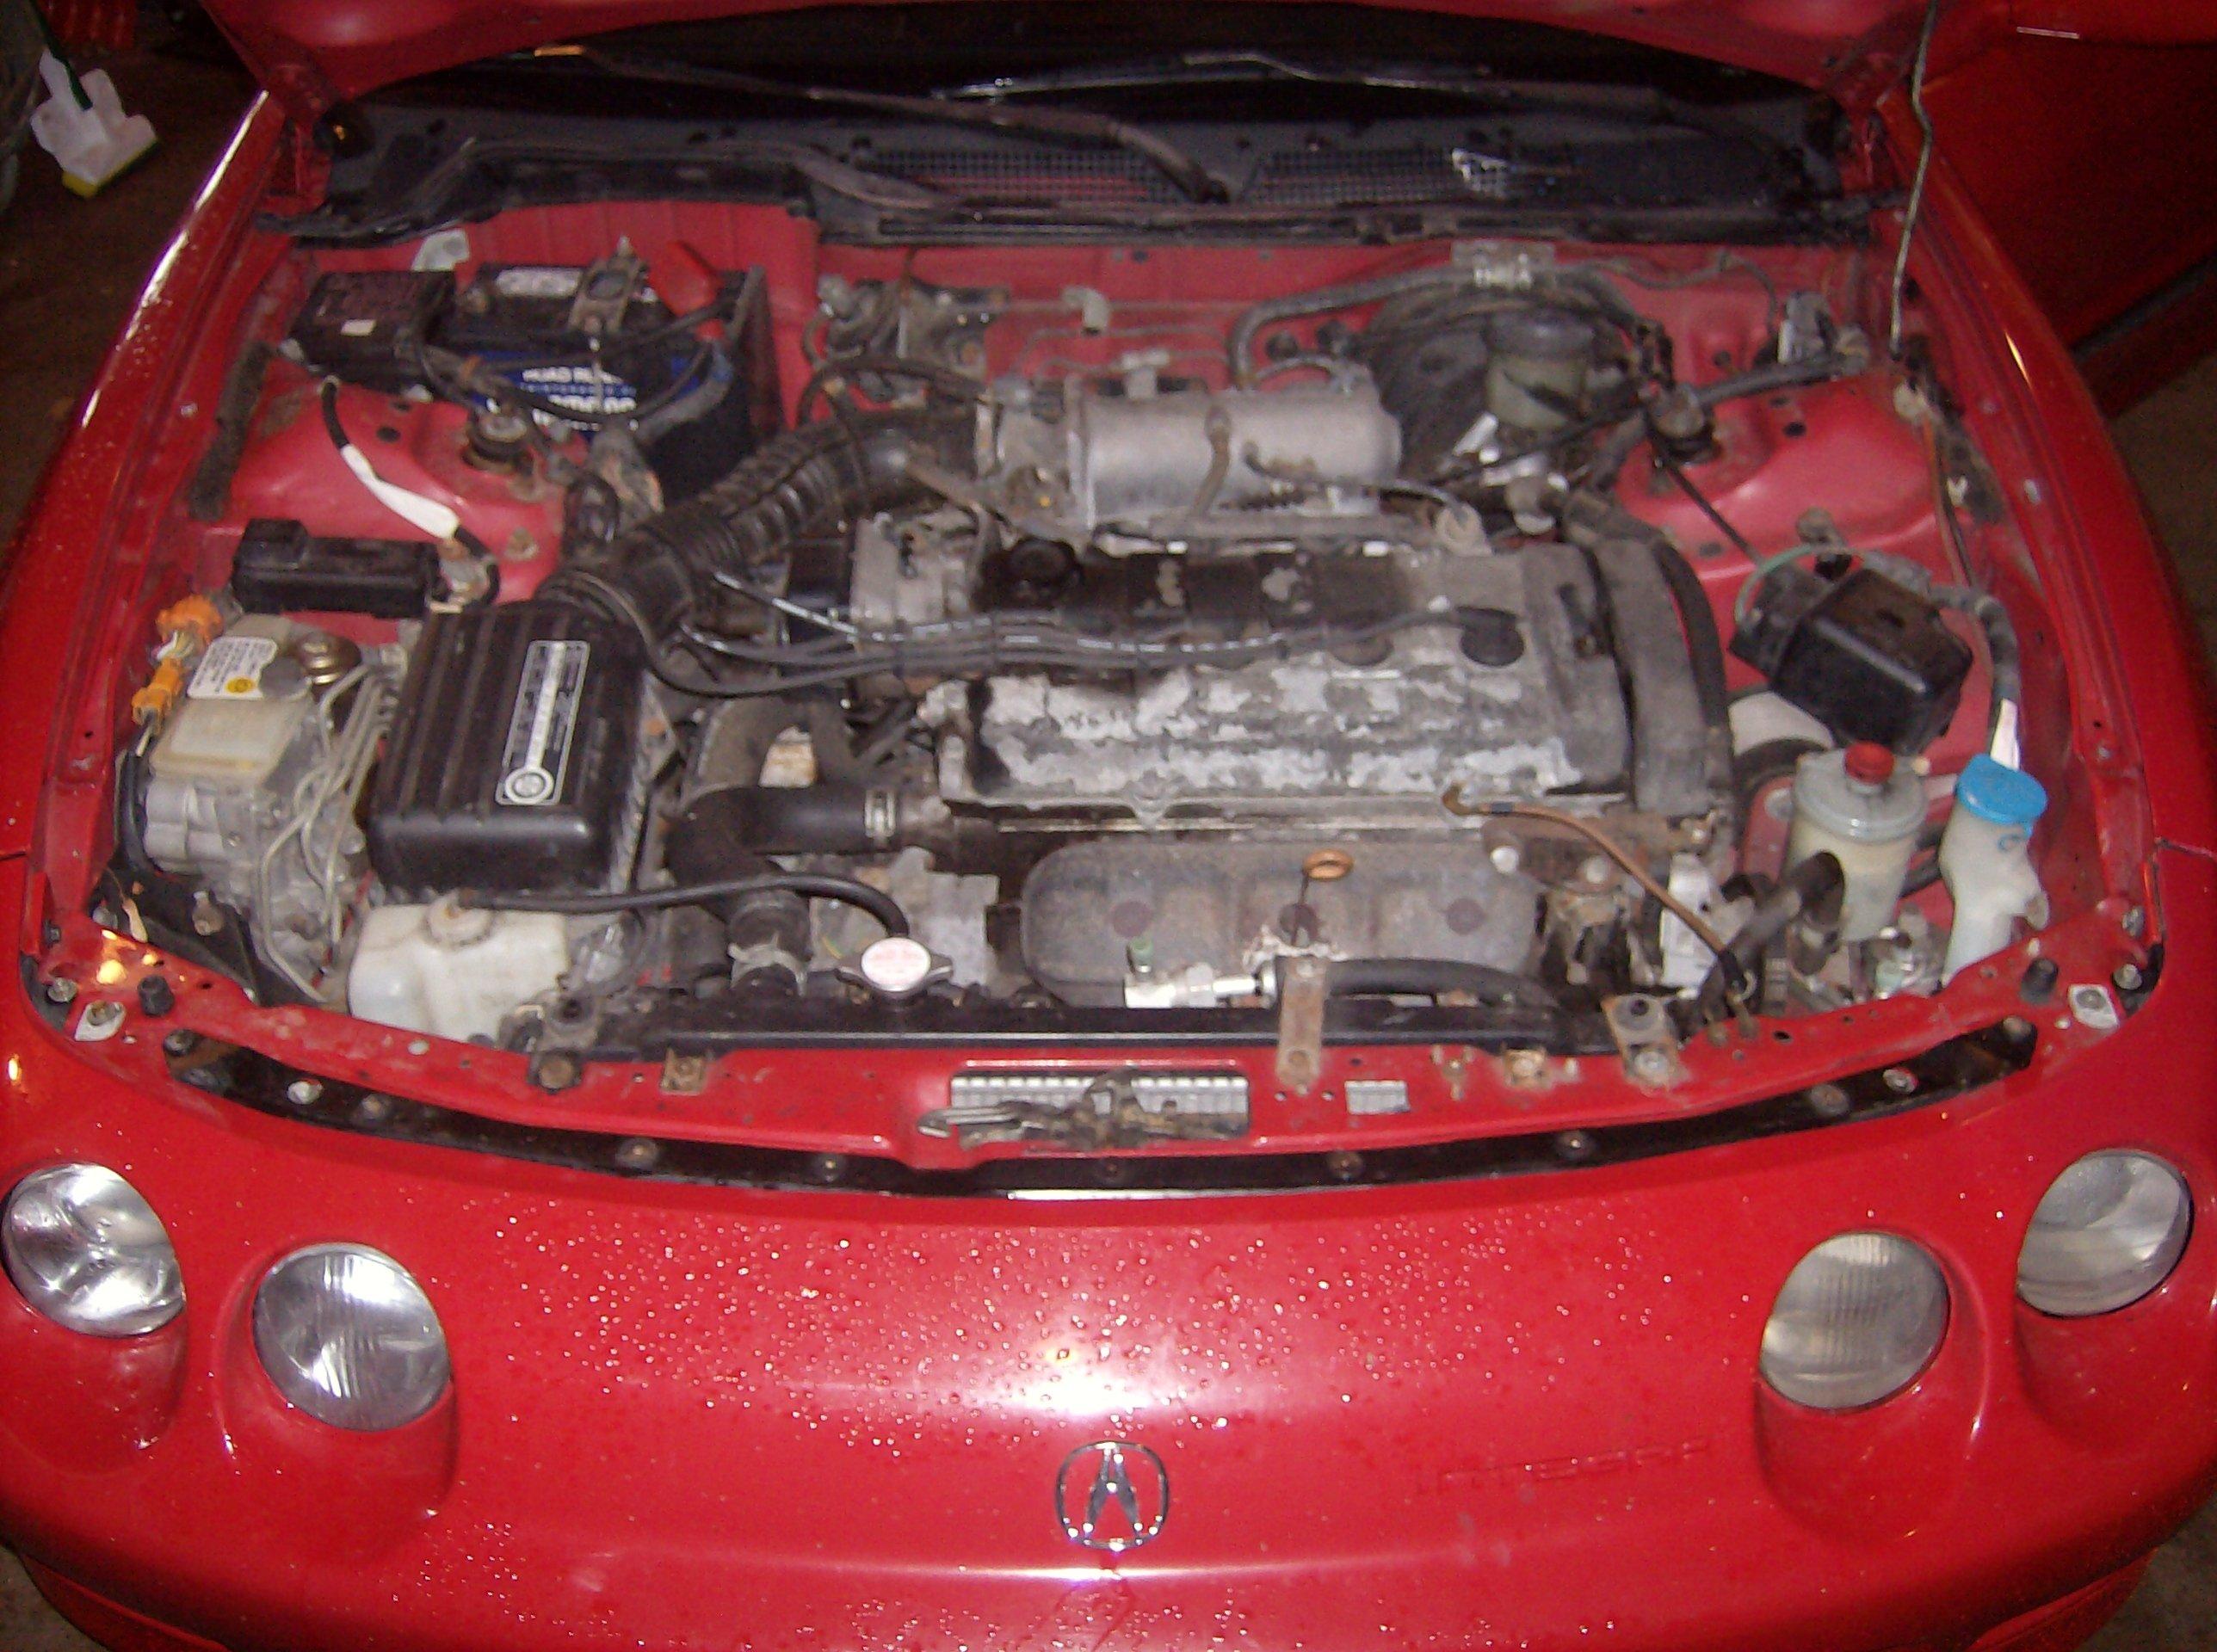 Acura Integra Nissan Z Forum Nissan Z Tech Forums - 94 acura integra engine for sale